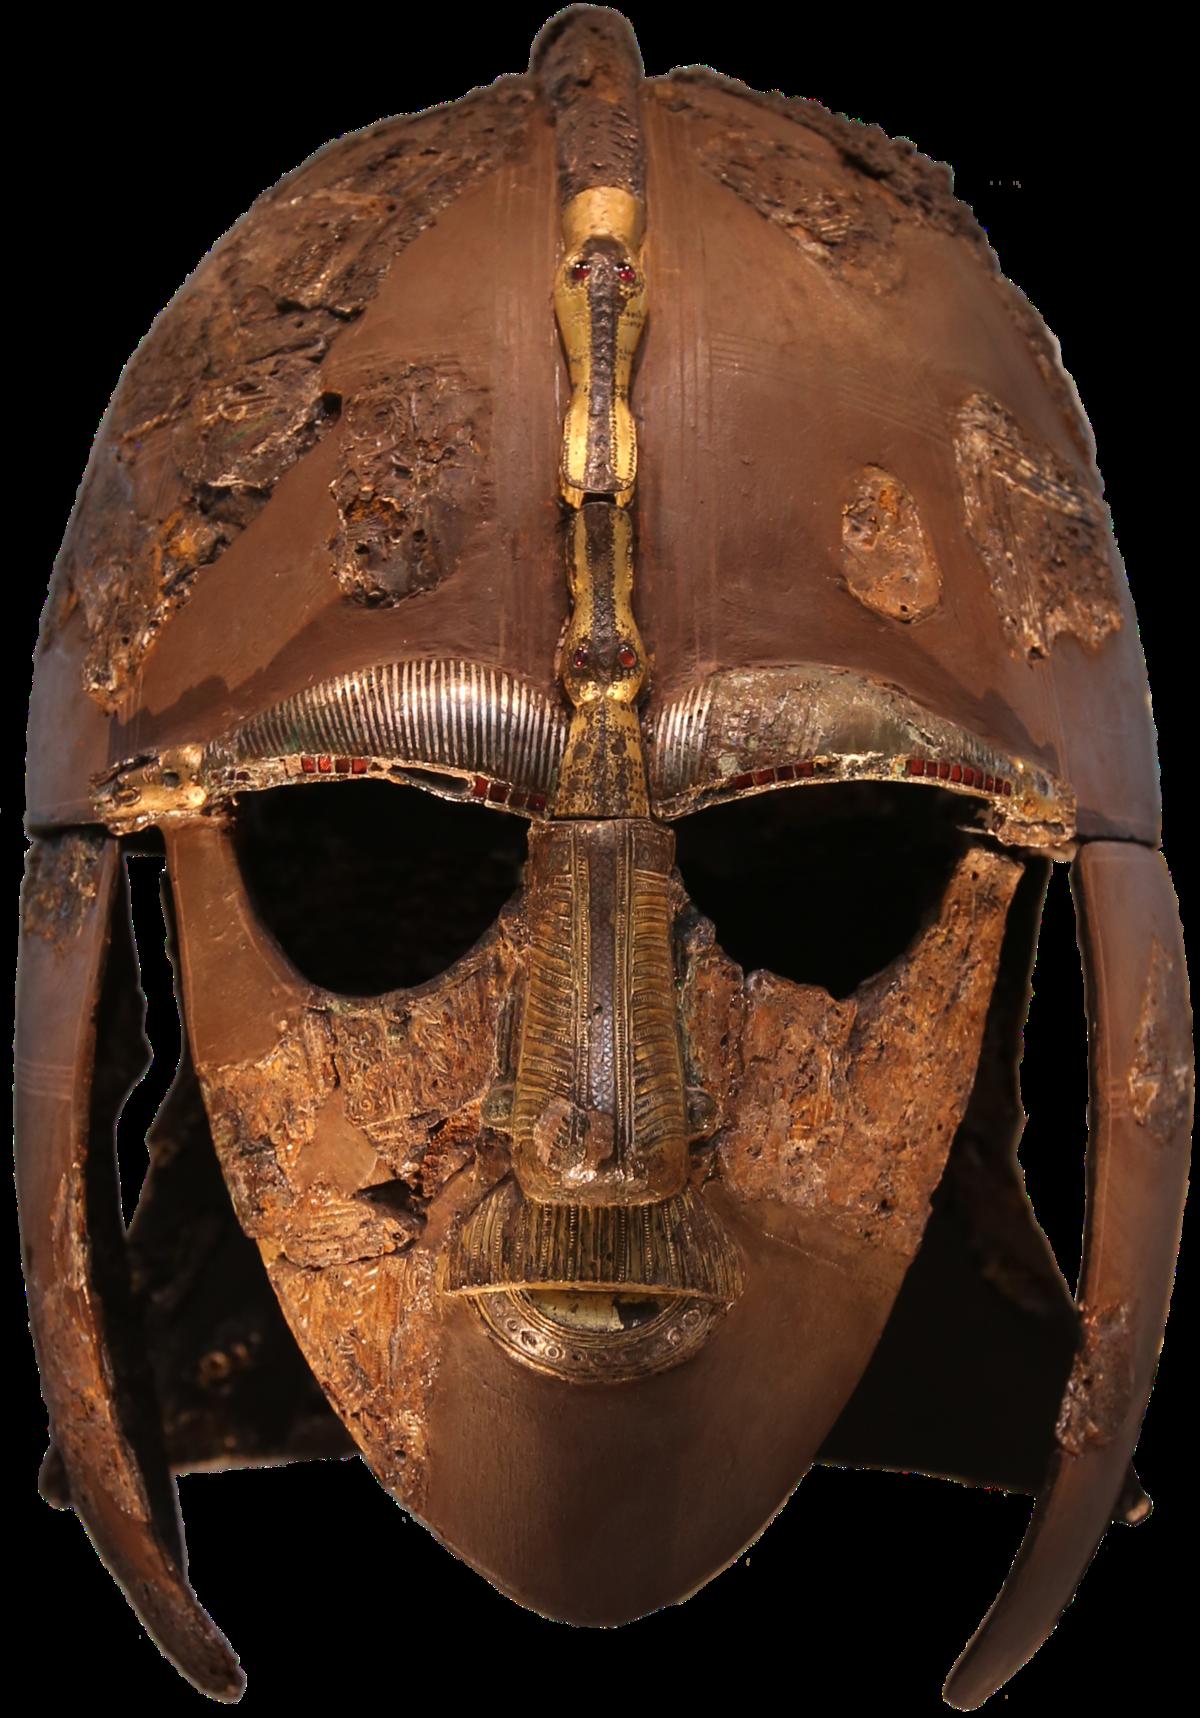 Sutton Hoo helmet - Wikipedia